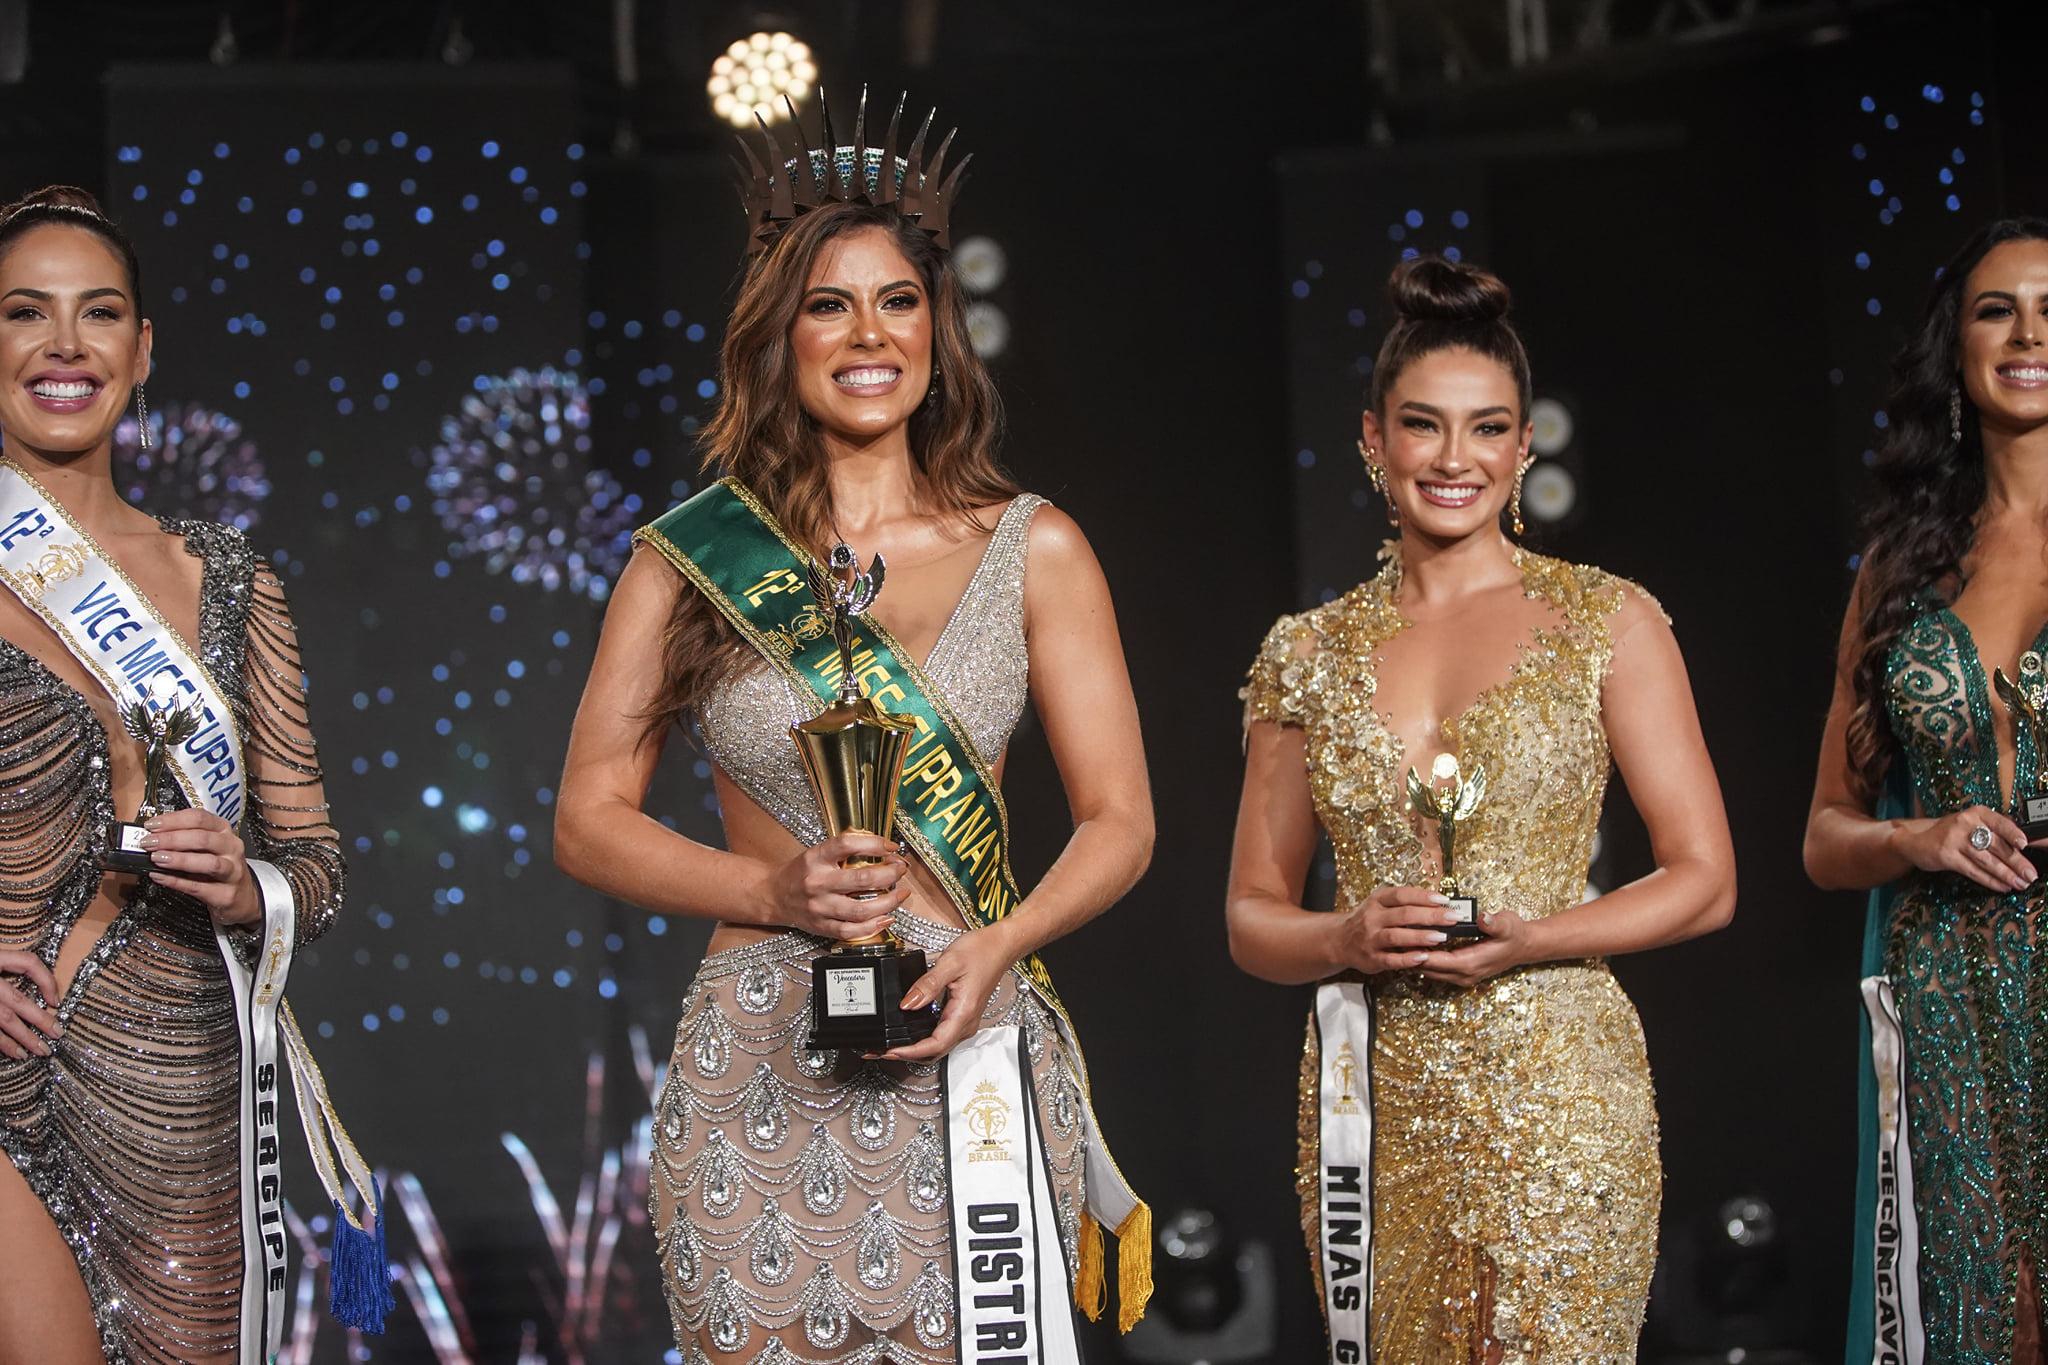 bruna zanardo, 1st runner-up de miss supranational brazil 2020/miss brasil internacional 2017/miss brasil terra 2016. - Página 20 12870510